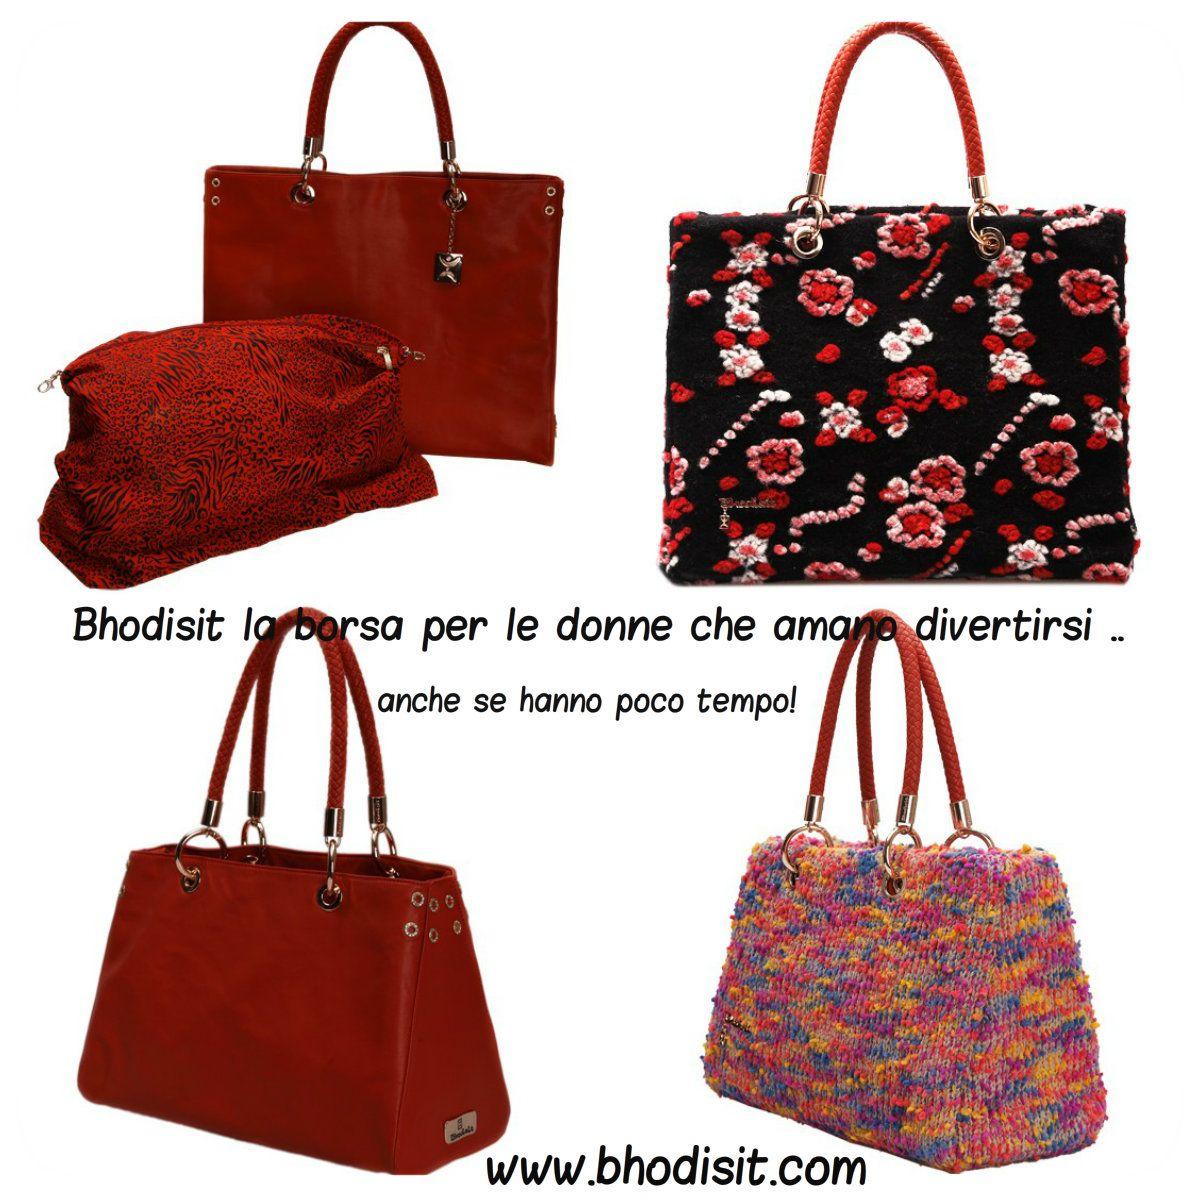 http://bhodisit.gostorego.com/shop-online/borsa-grande.html